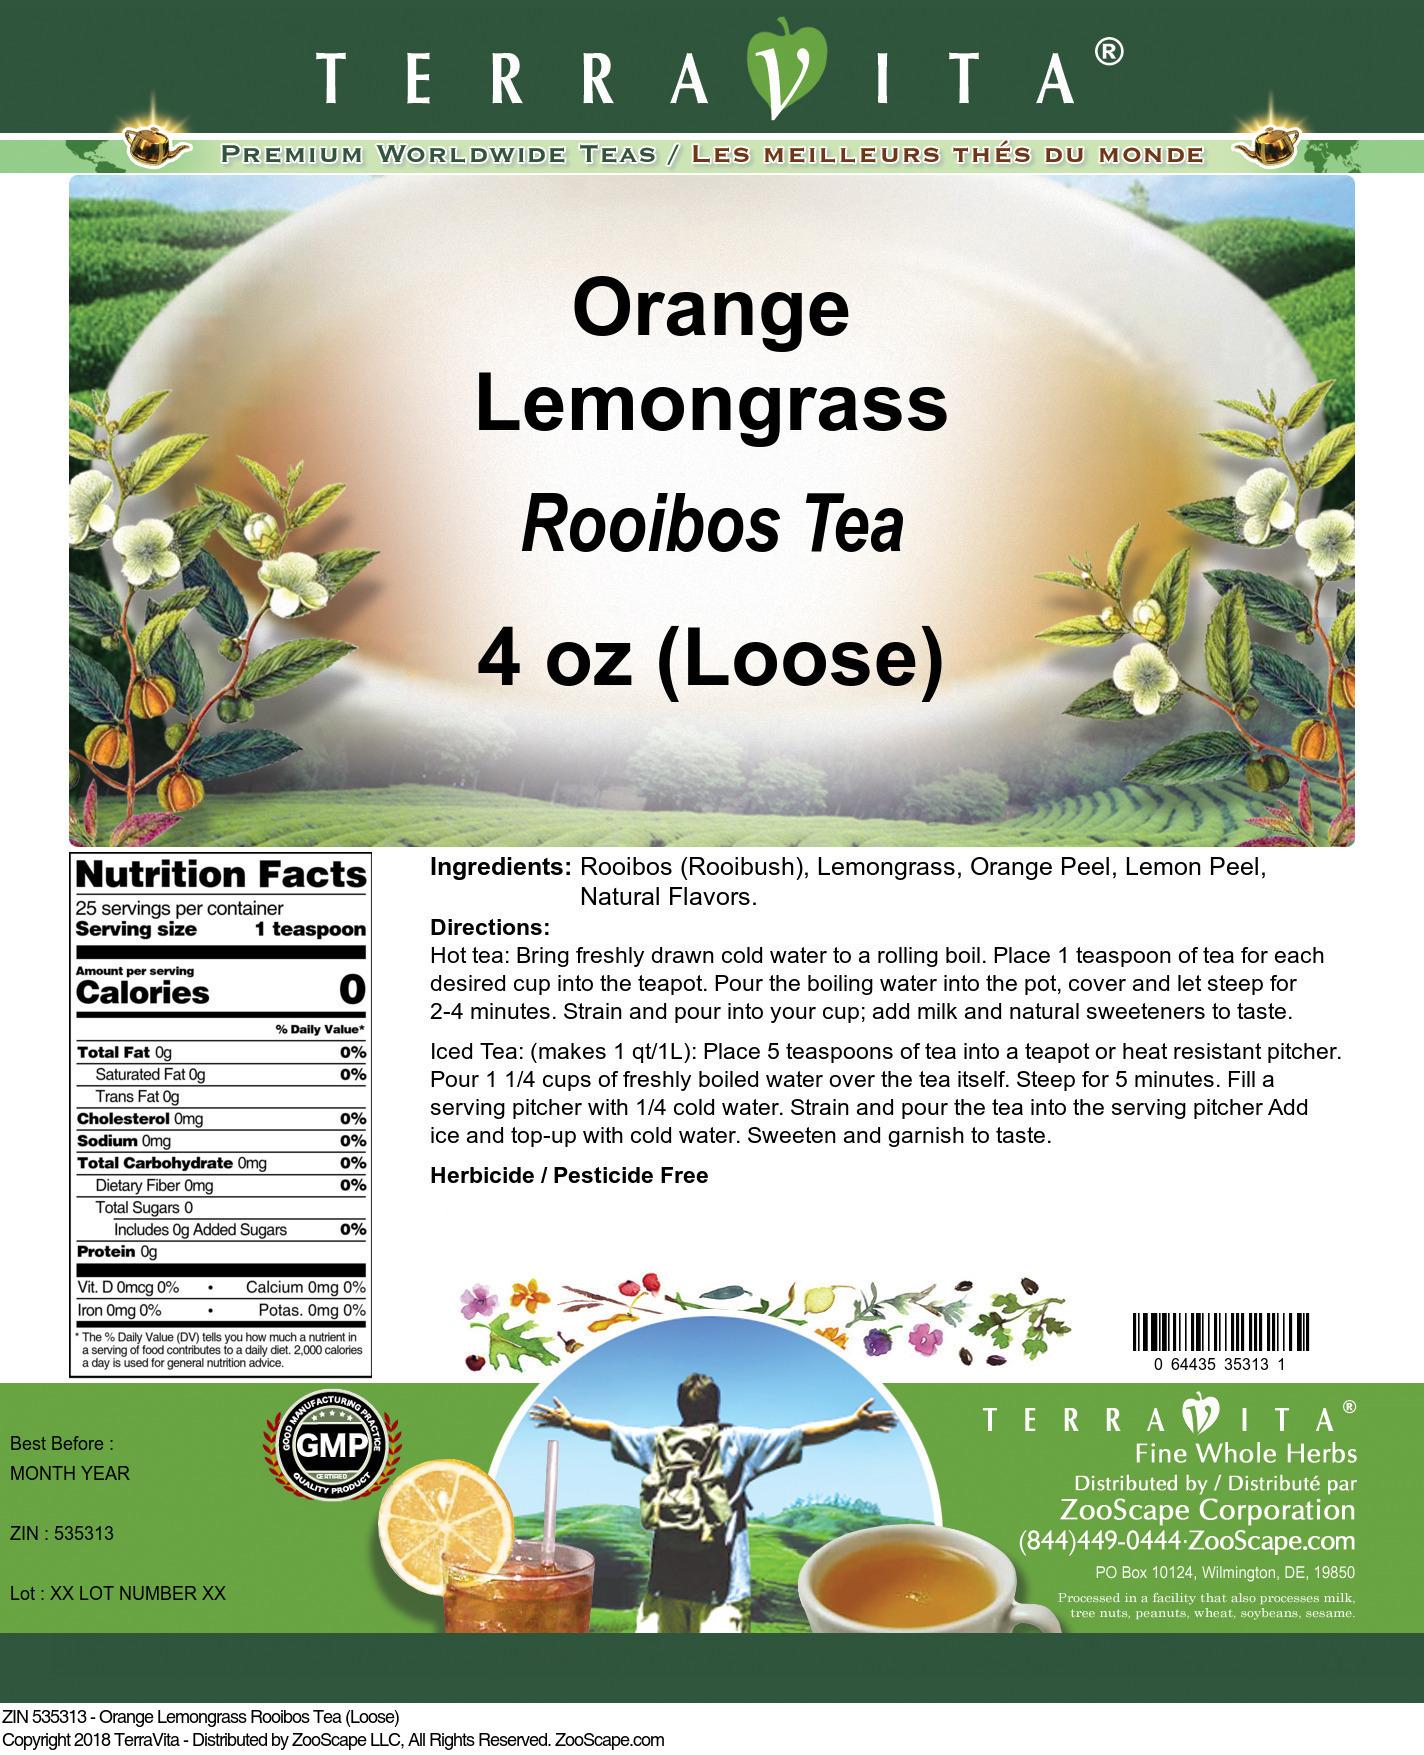 Orange Lemongrass Rooibos Tea